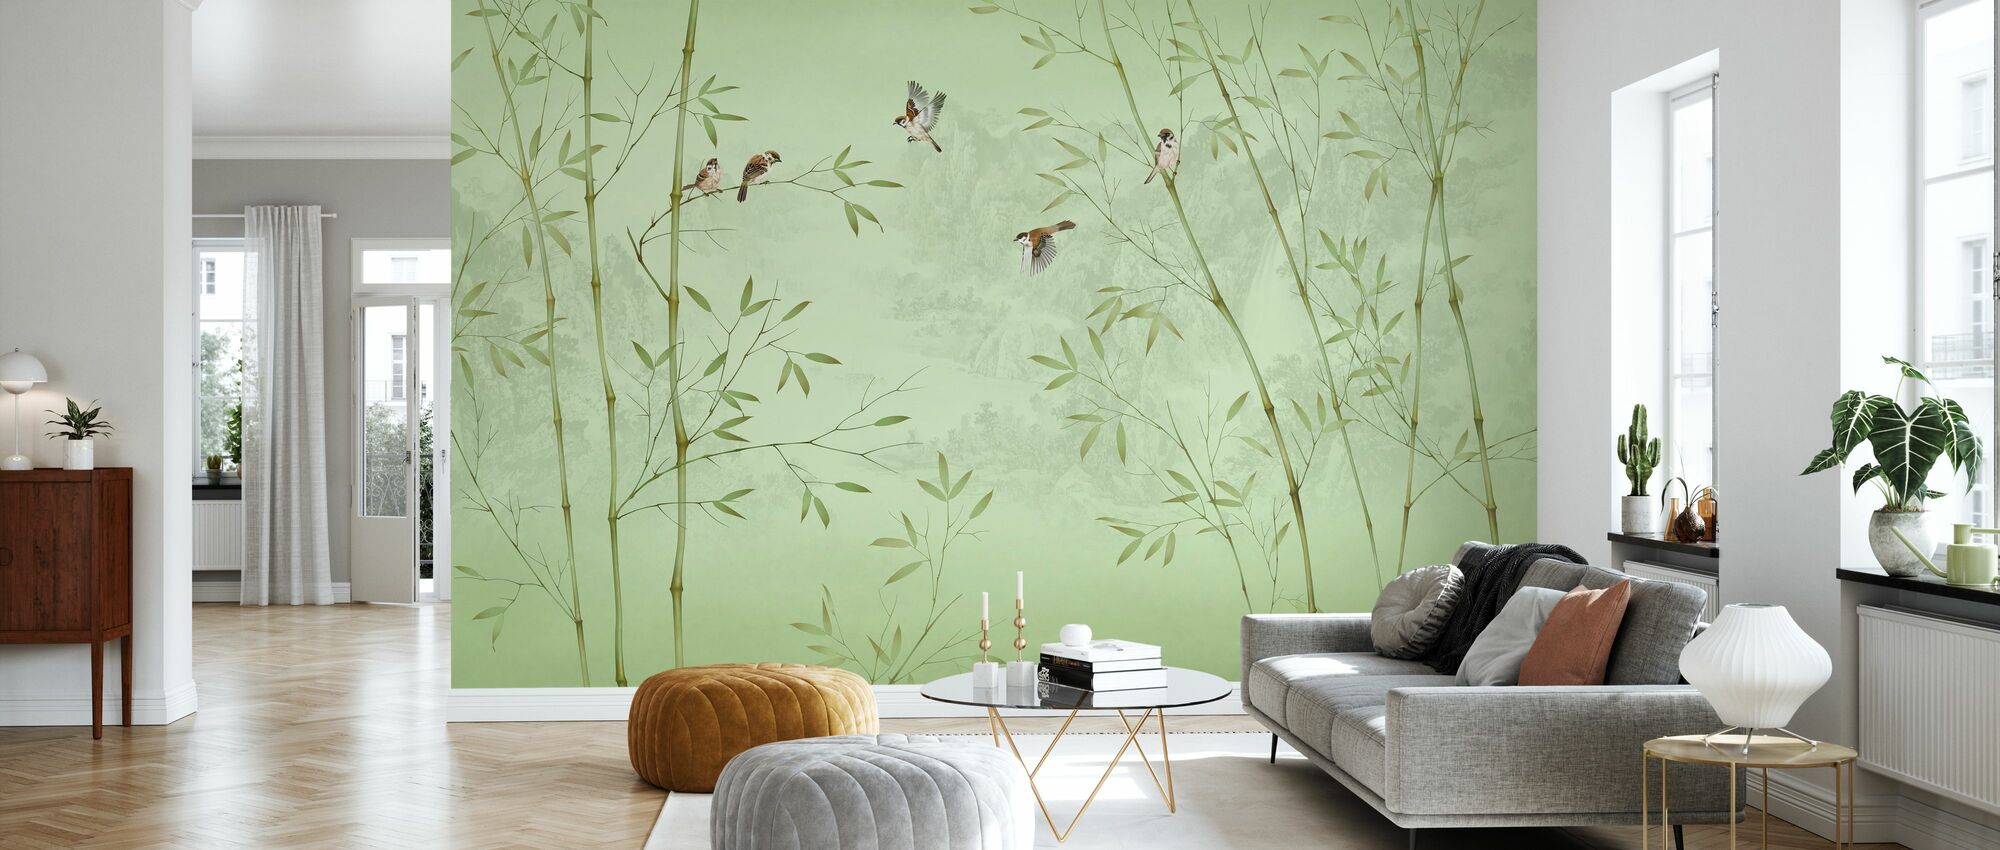 Uccelli di bambù -Smeraldo - Carta da parati - Salotto